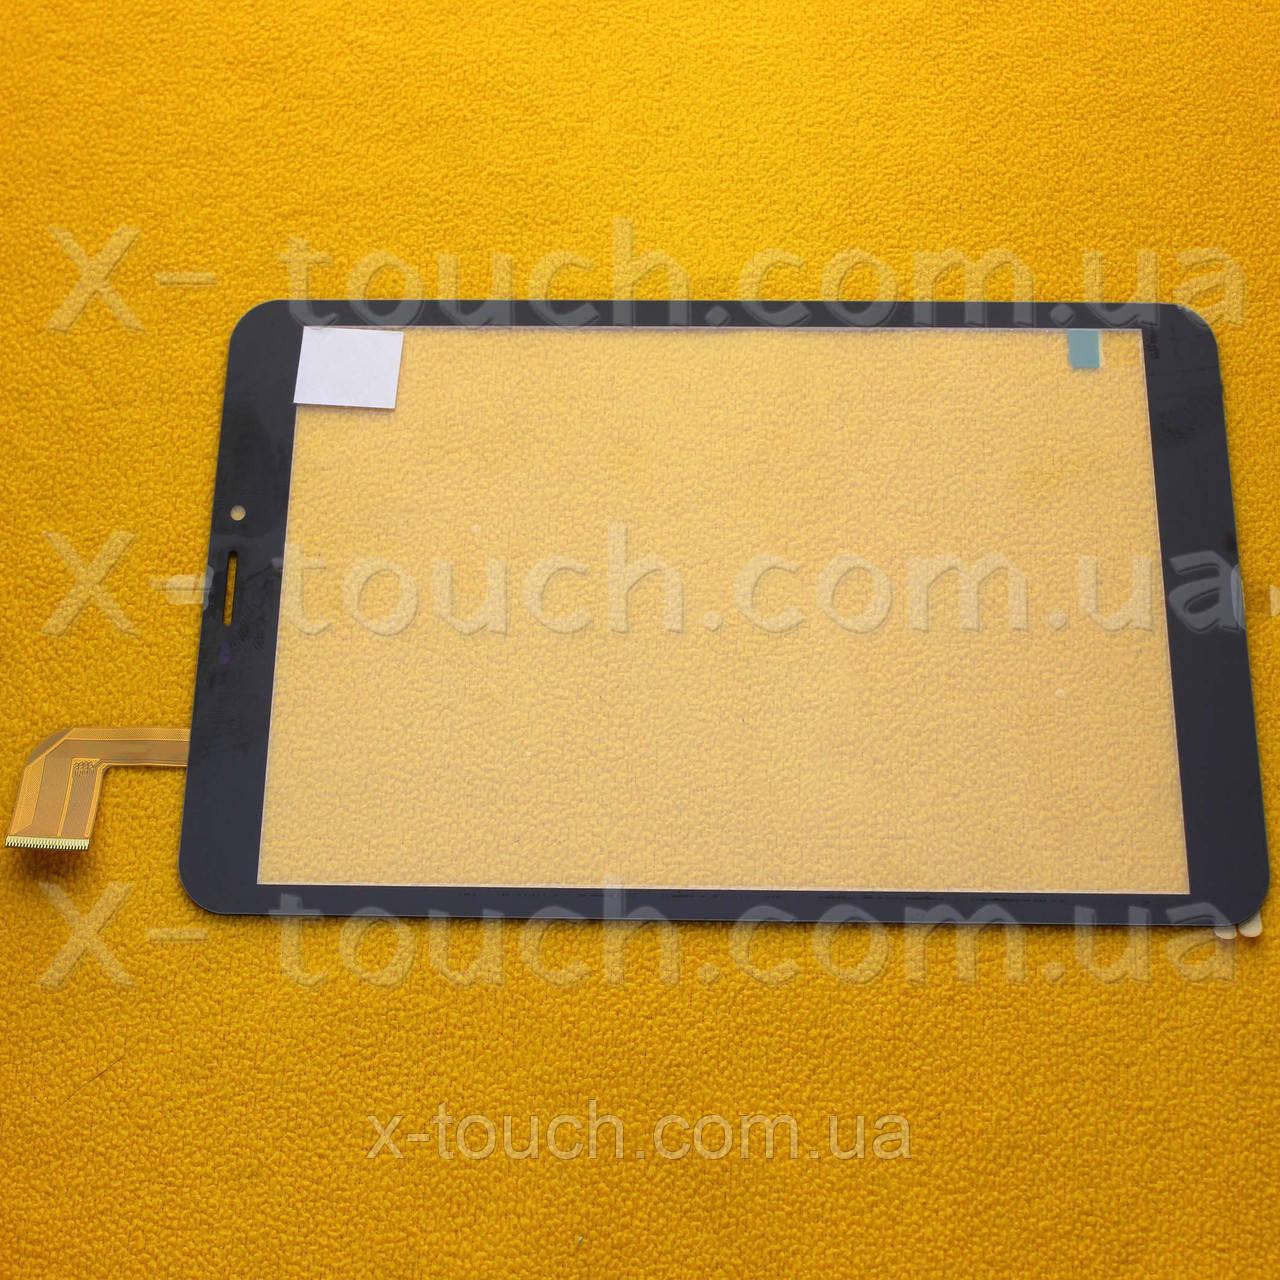 Тачскрин, сенсор HK80DR2840 для планшета